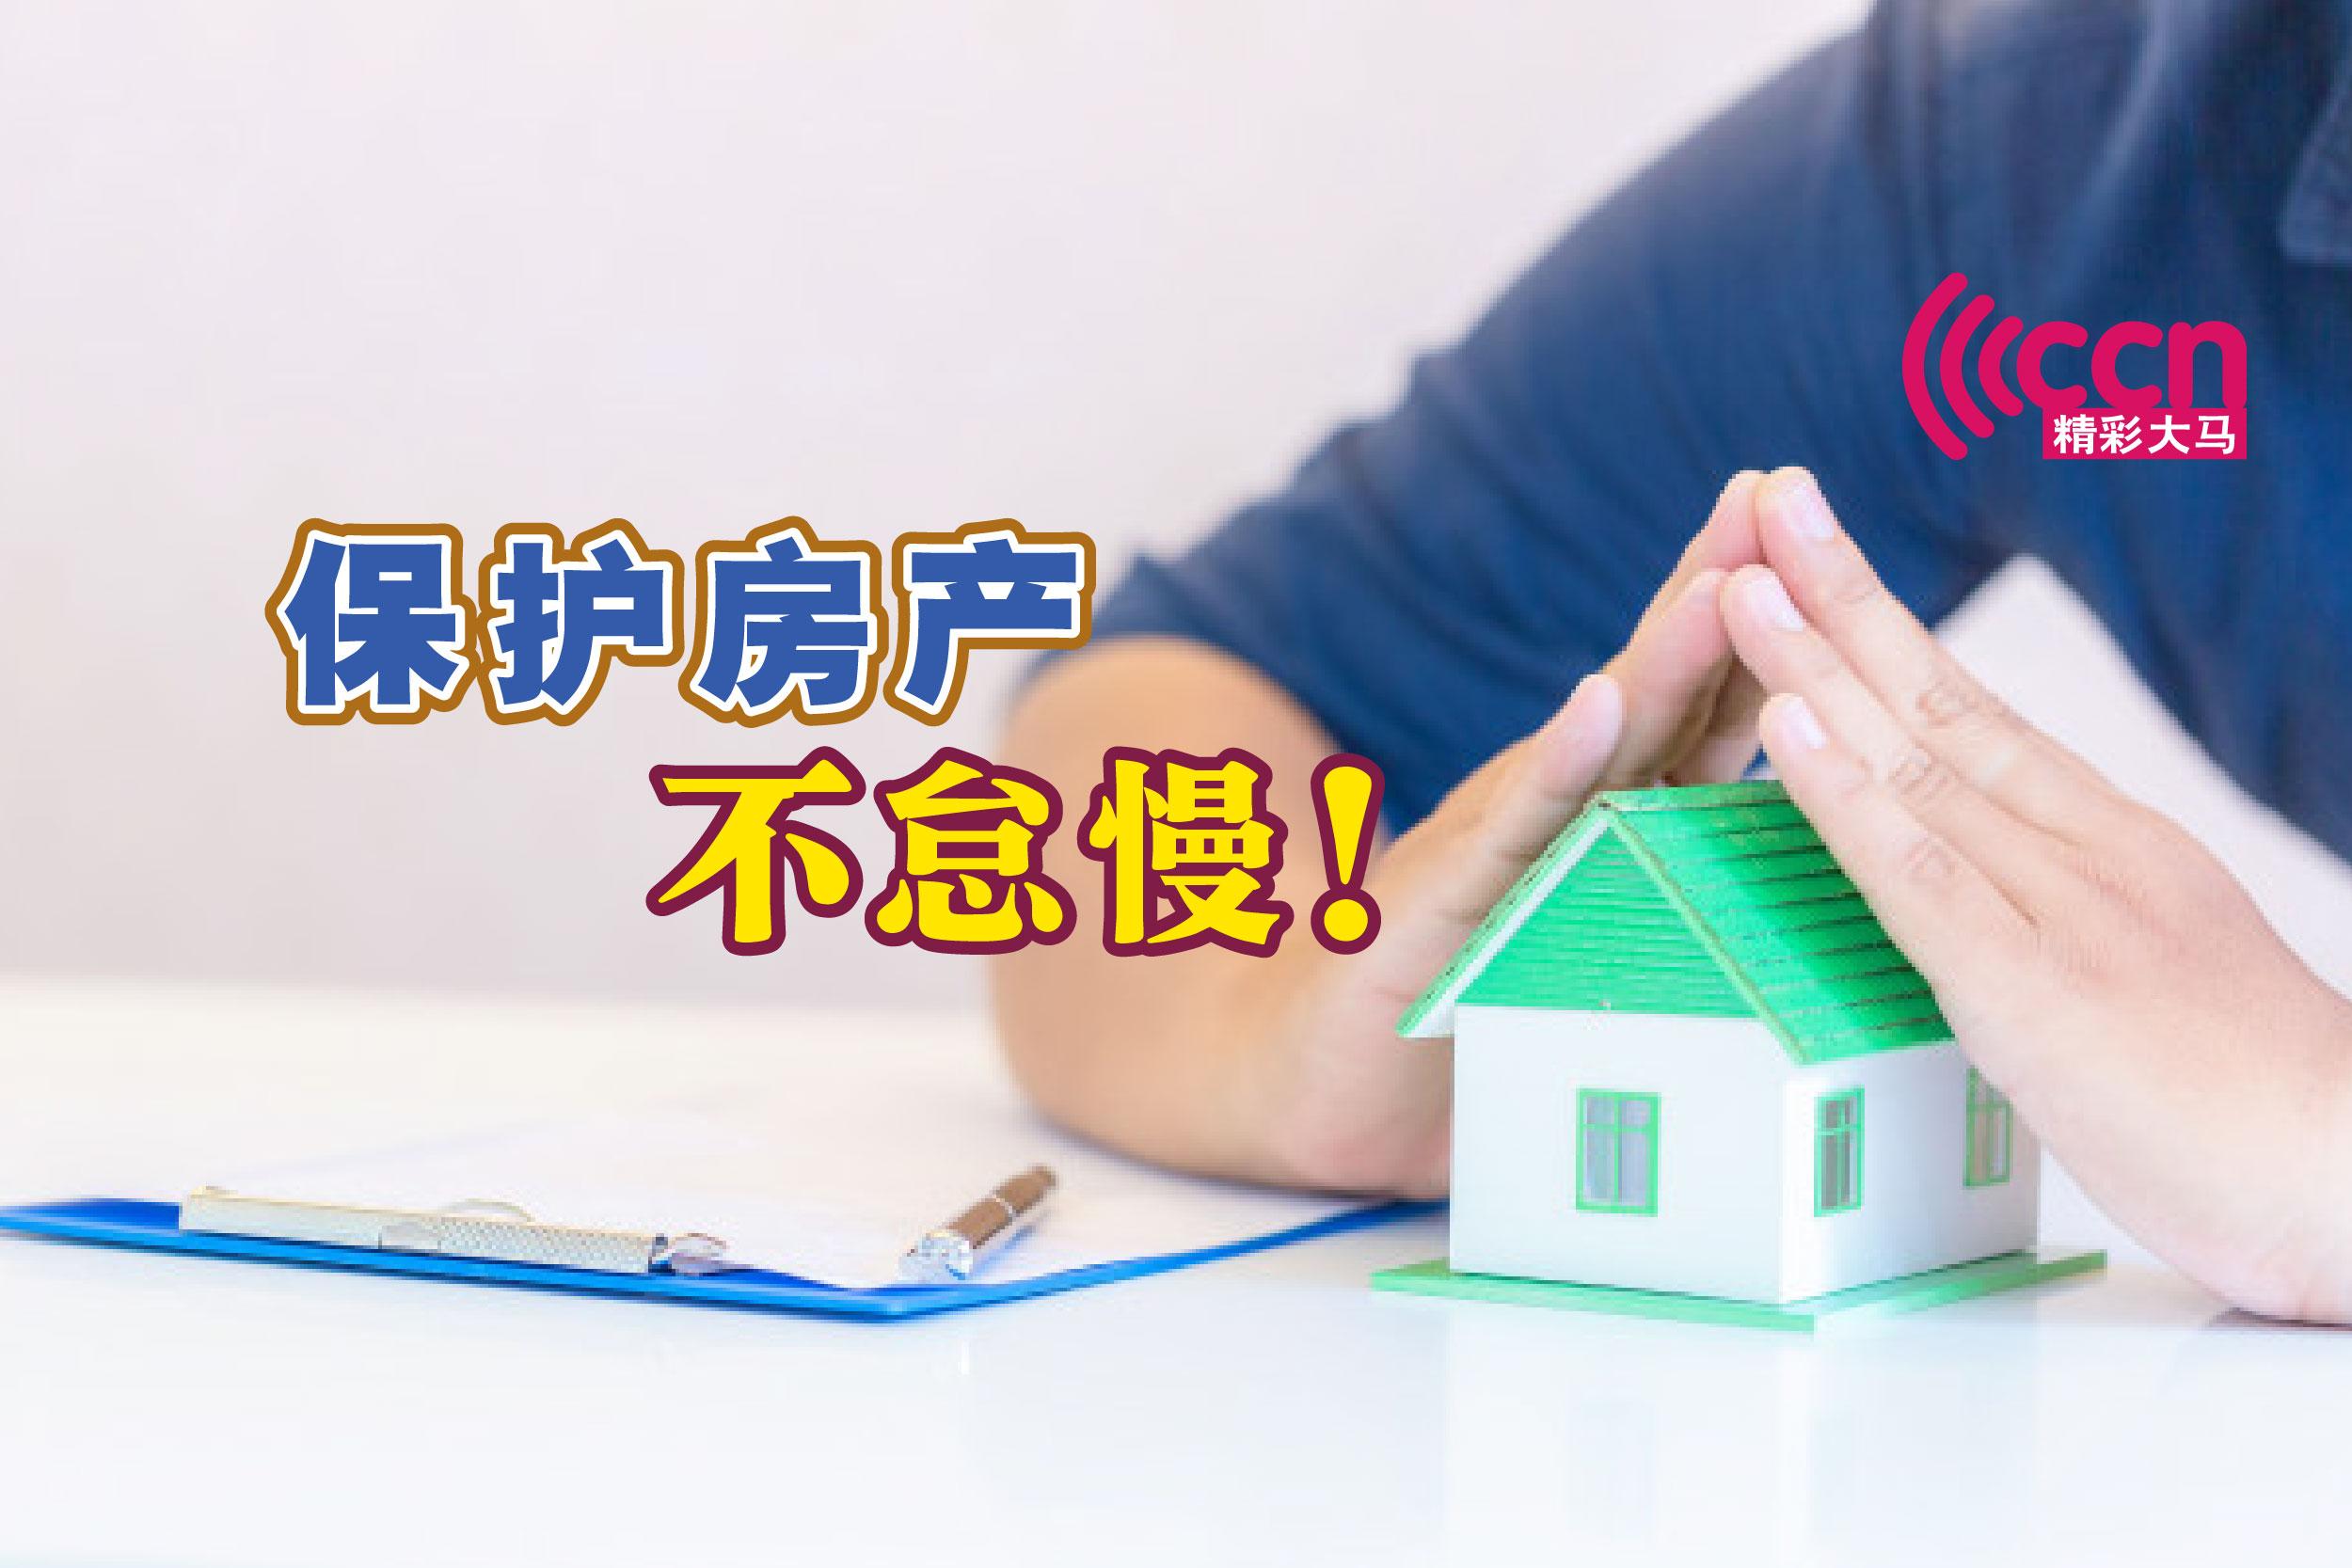 "Blue Duck携手M.A.S.O和利宝保险公司,推出的""零押金租屋保险""计划将会改变传统的租屋方式,同时有助减少潜在的租赁纠纷。-图摘自Freepik,精彩大马制图-"